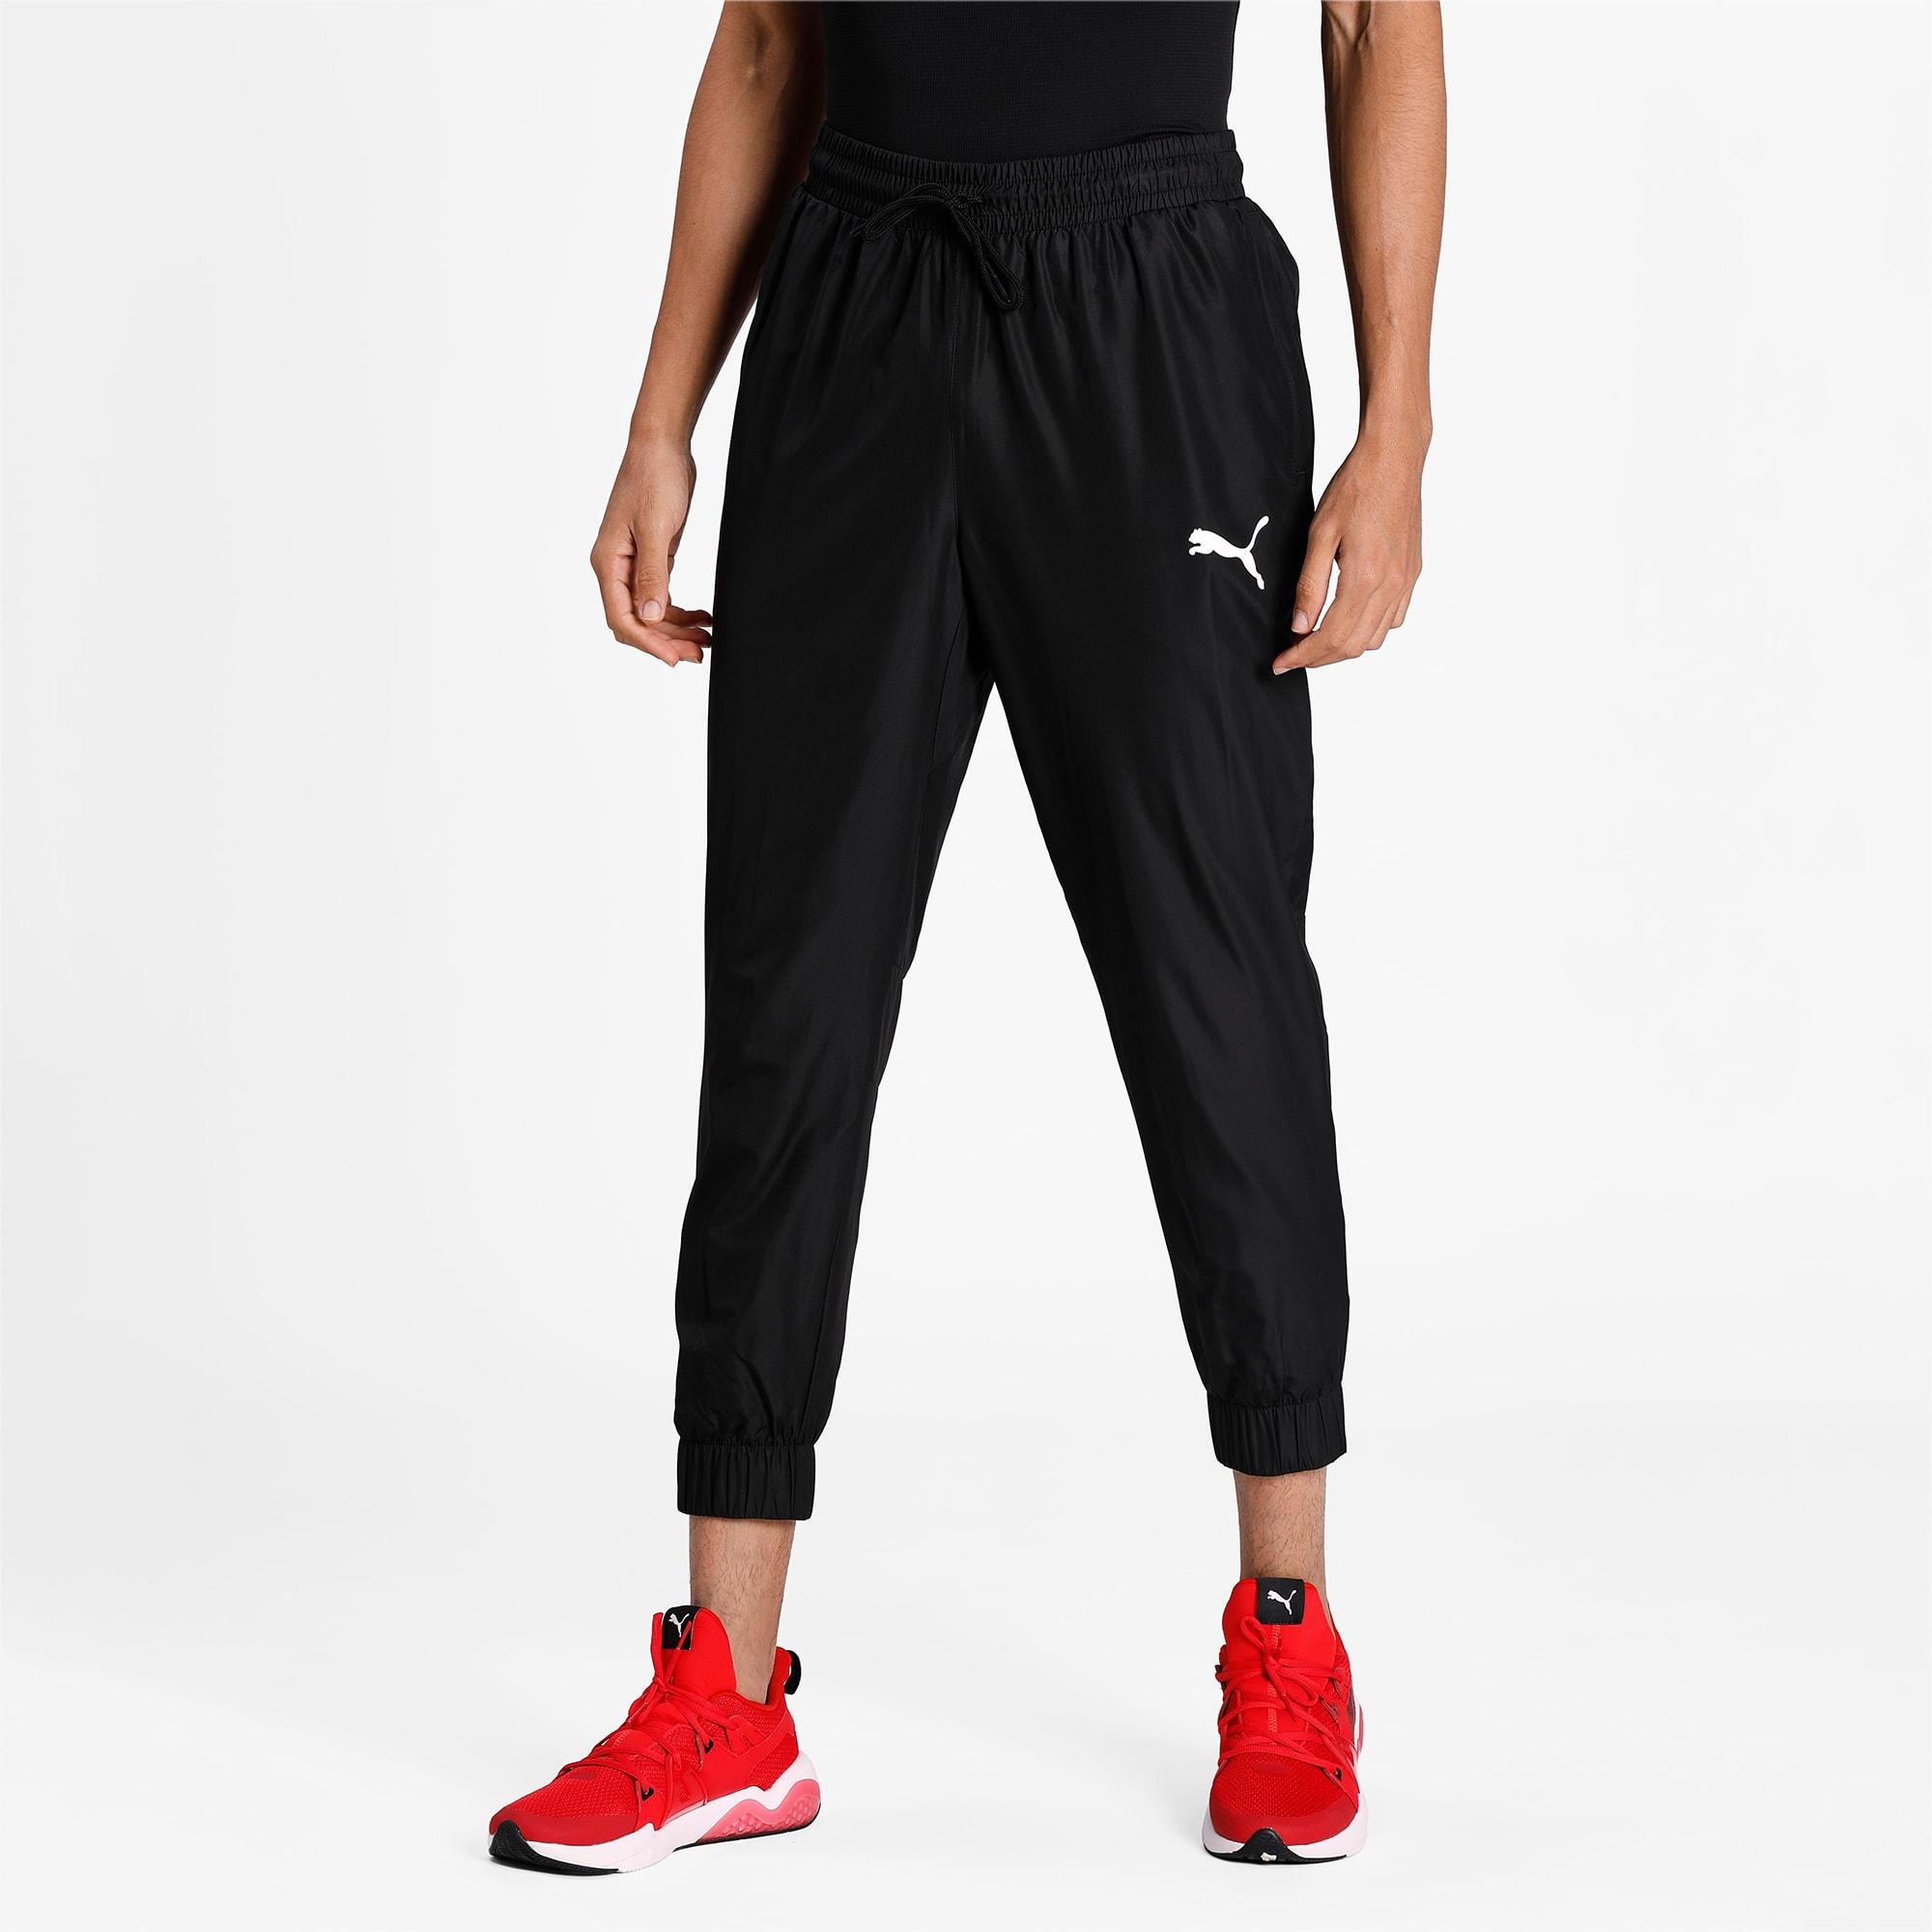 Cross The Line Warm Up Men's Performance Pants